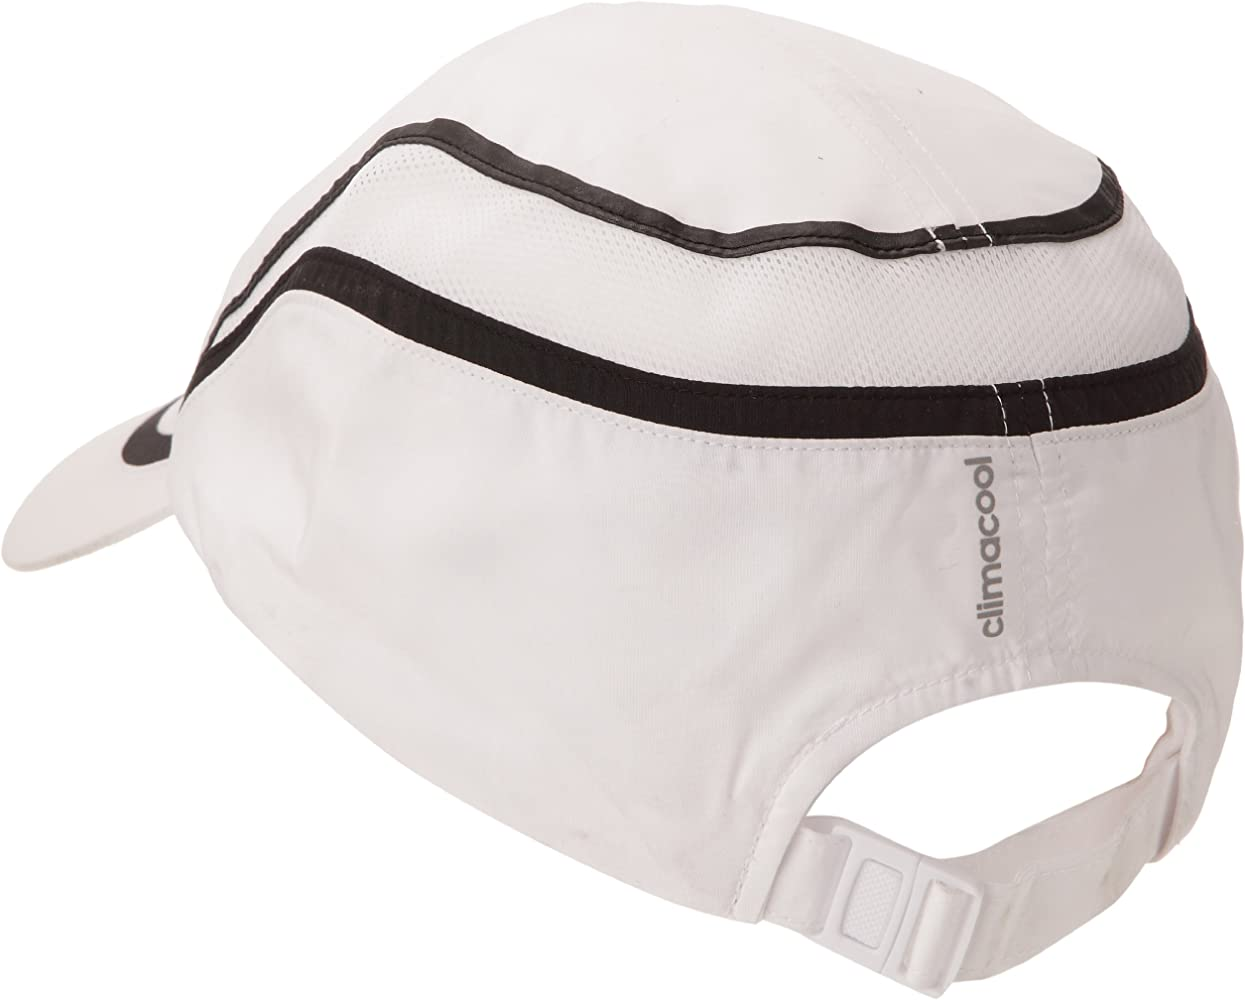 adidas Kappe Run Climacool - Prenda para Hombre, Color Blanco ...